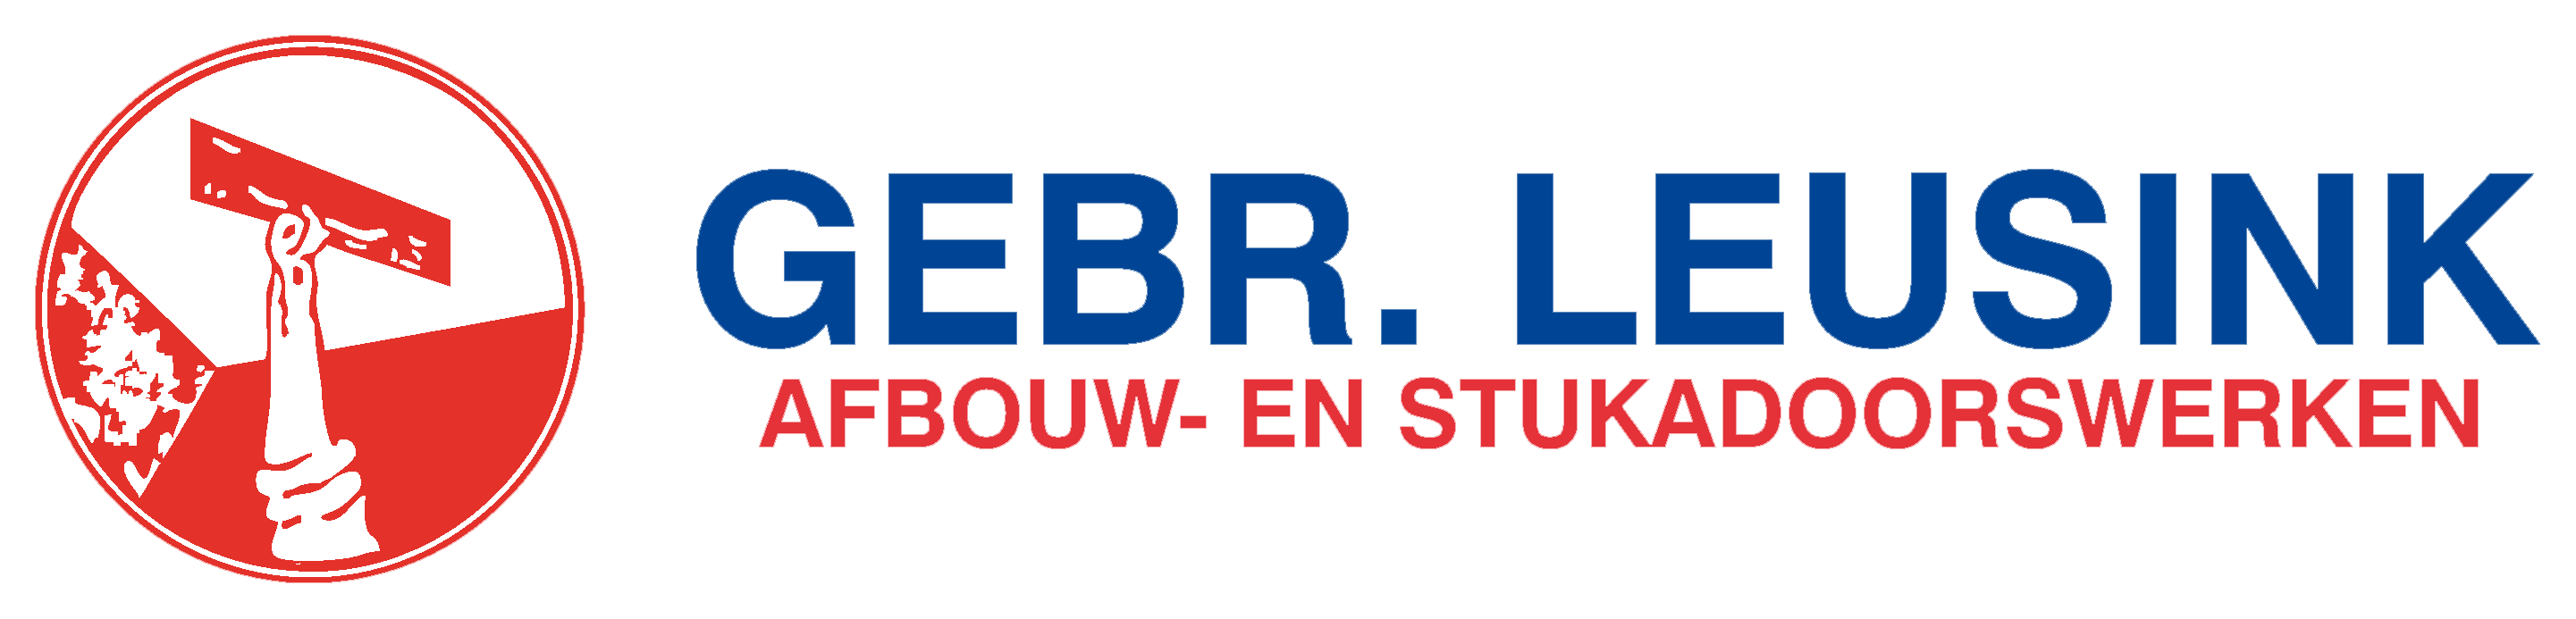 Logo Gebr. Leusink